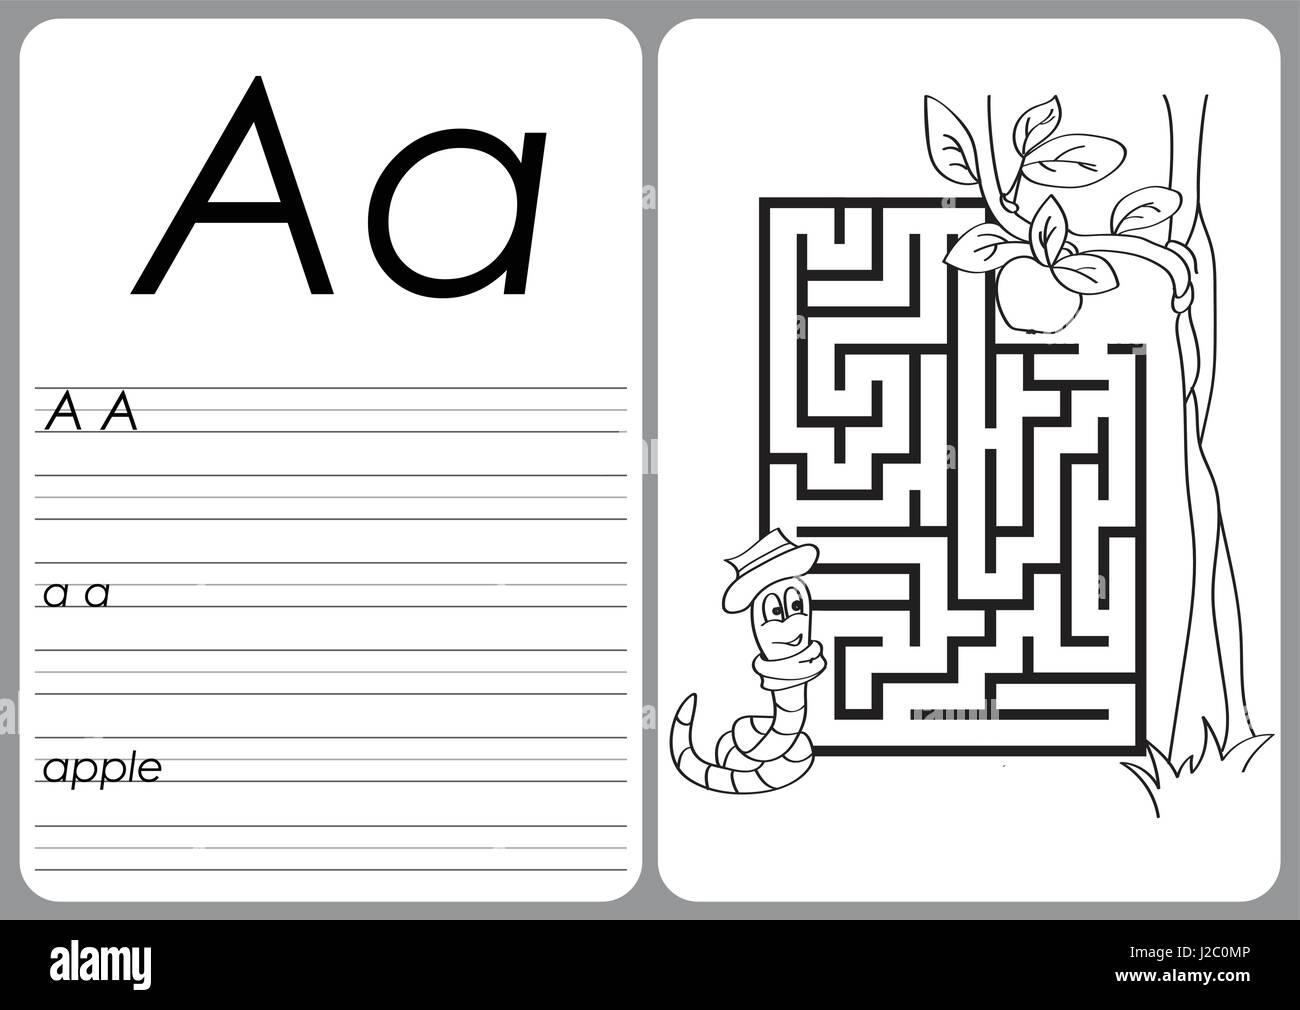 Alphabet A-Z - Puzzle Arbeitsblatt - Malbuch Vektor Abbildung - Bild ...